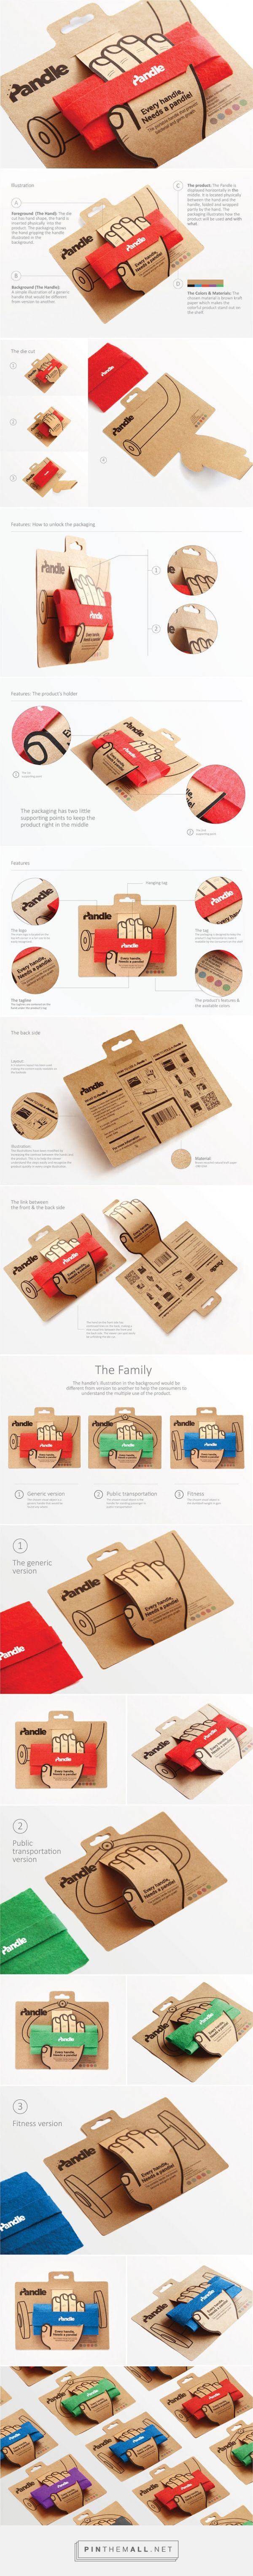 Pandle grip packaging designed by Hani Douaji…